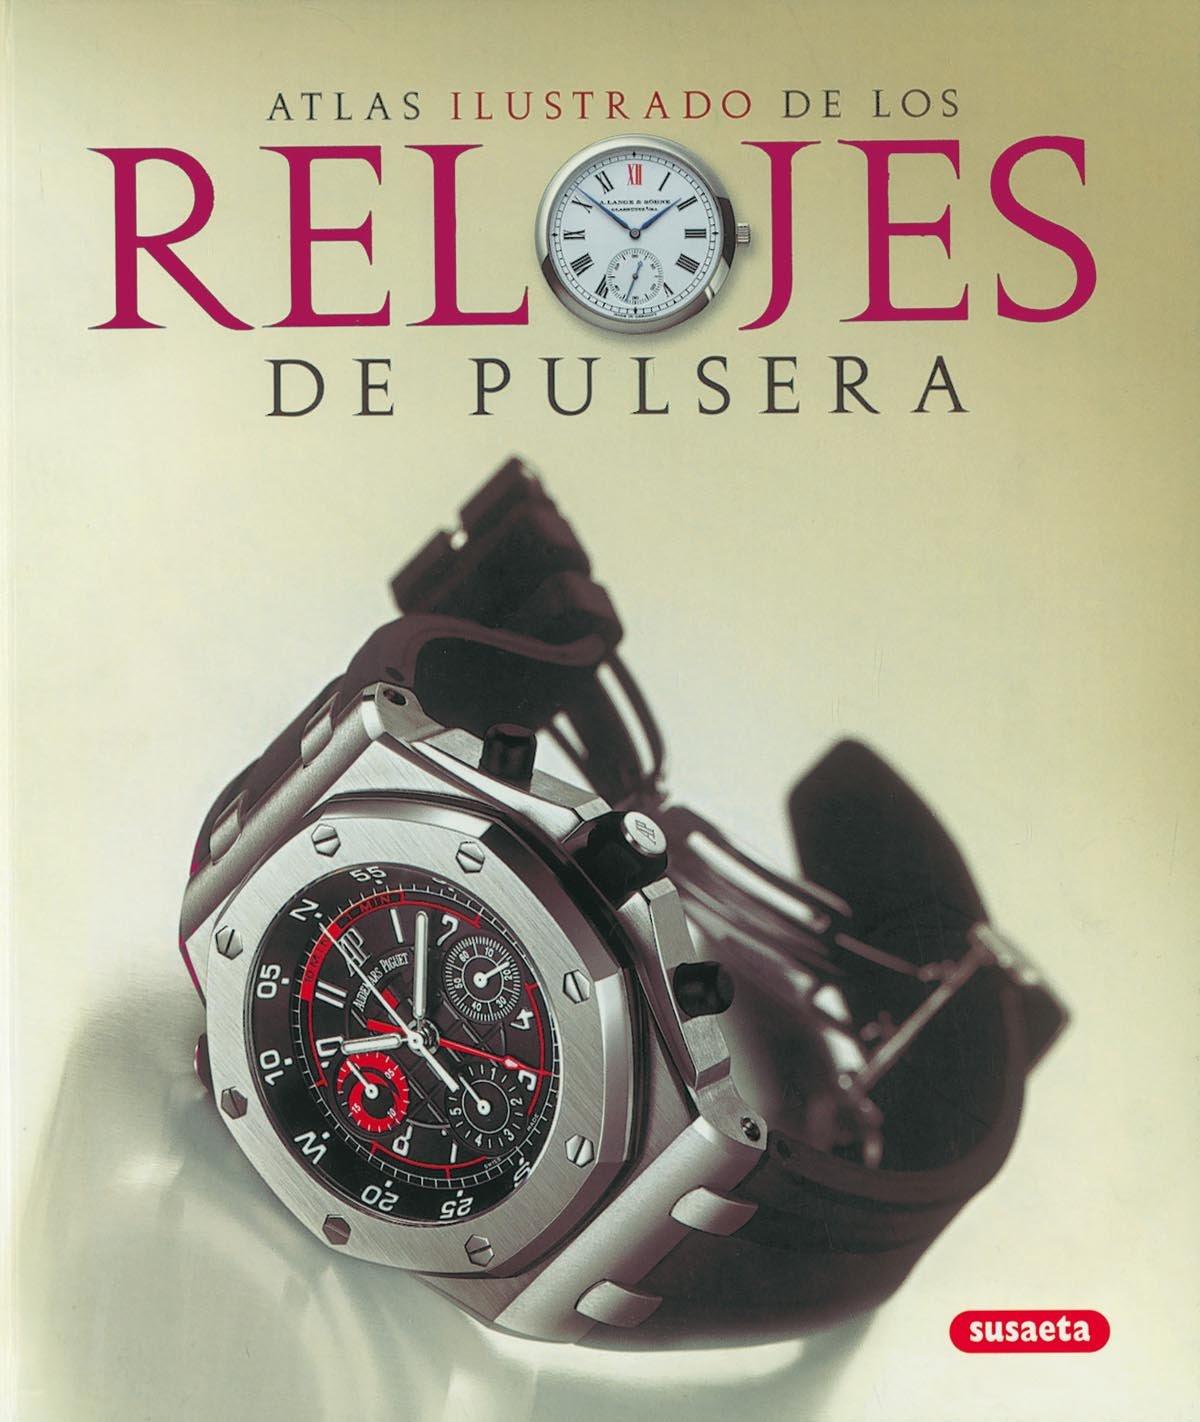 Relojes de Pulsera (Spanish) Hardcover – 2013